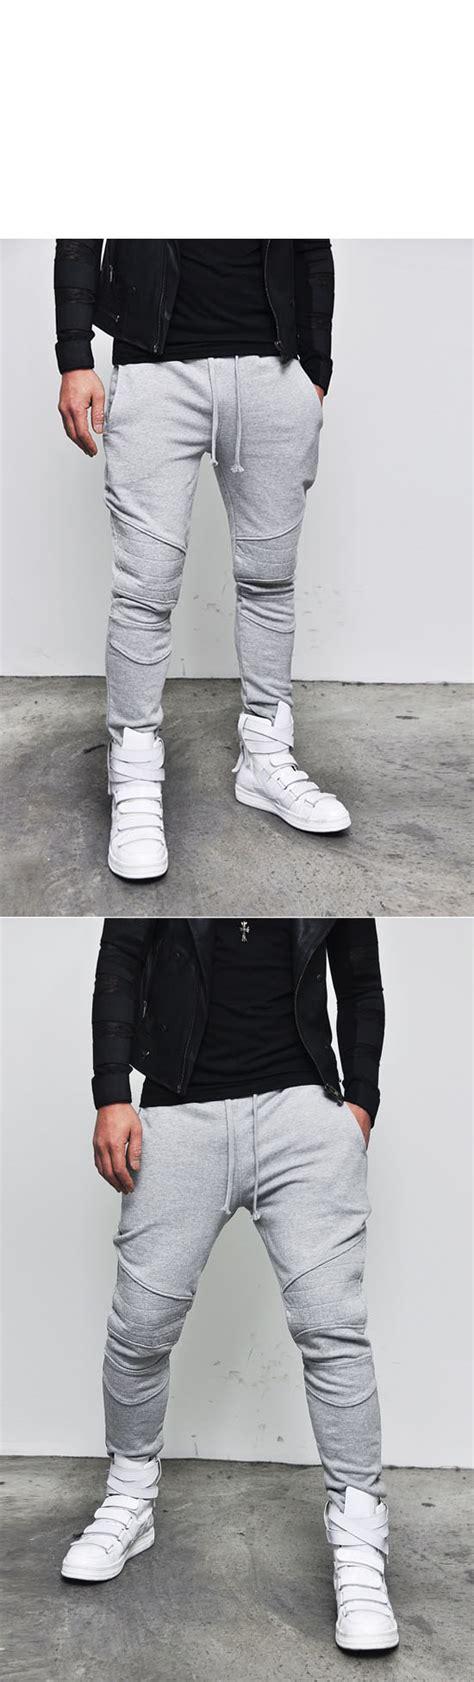 Sweater Hoodie Zipper Uber New Edition Terlaris seaming detailed mens runway biker jersey black gray sweatpants by guylook ebay